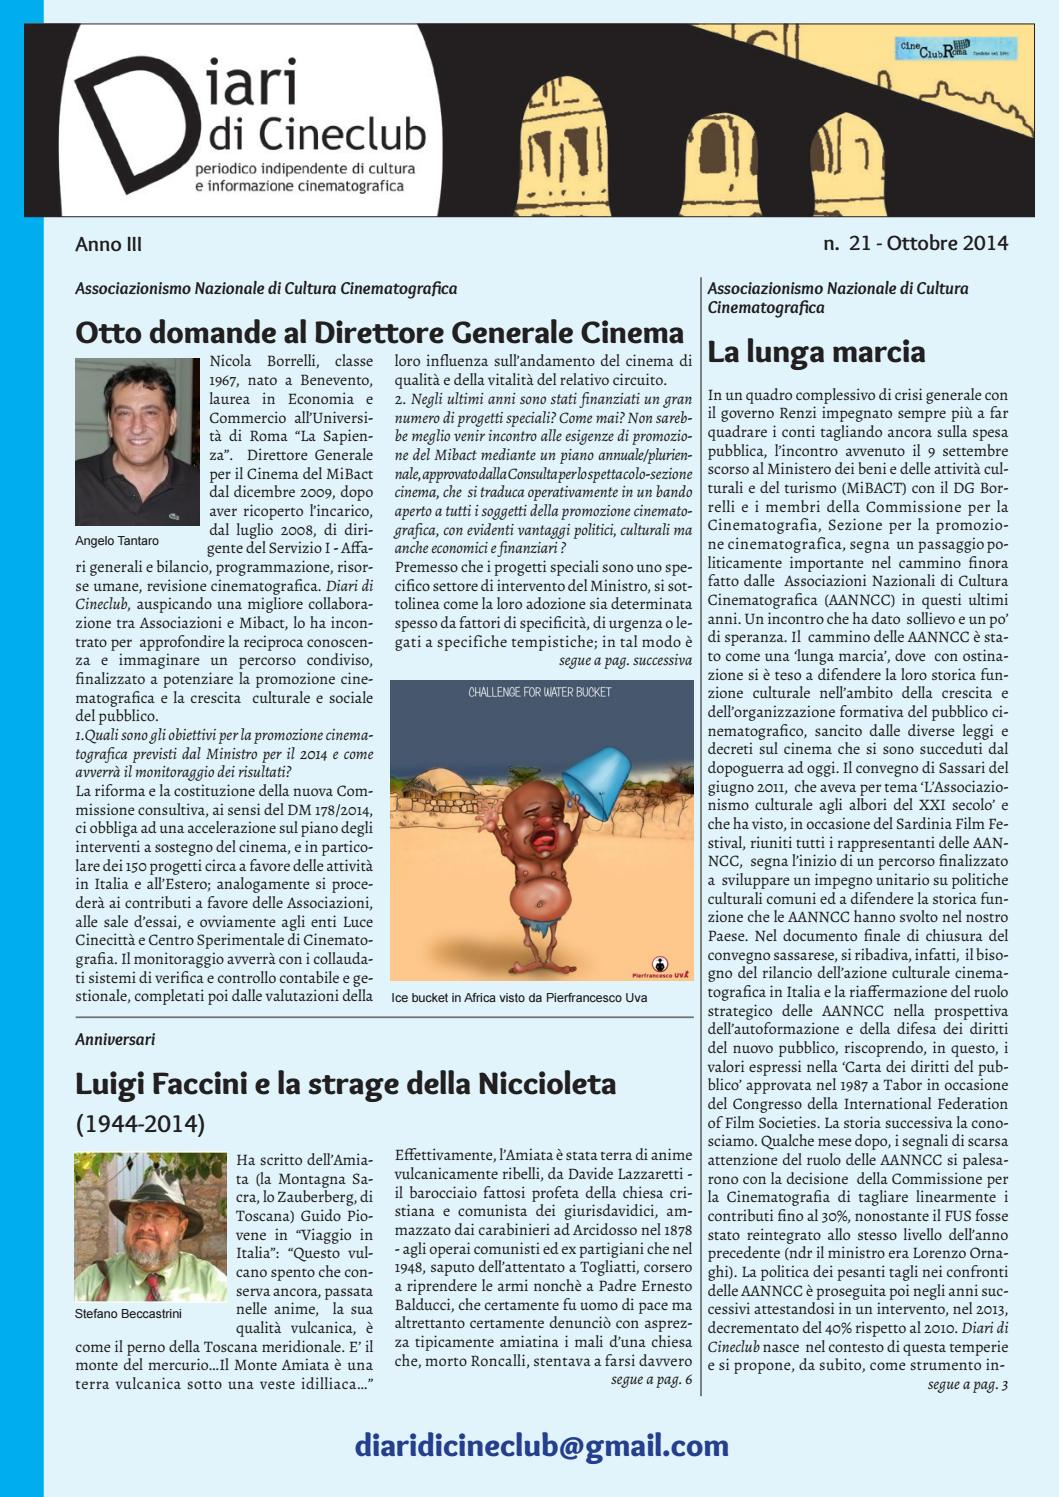 Diari di Cineclub - Numero 21 (Ottobre 2014) by Band Apart - issuu ac8fe1ac9